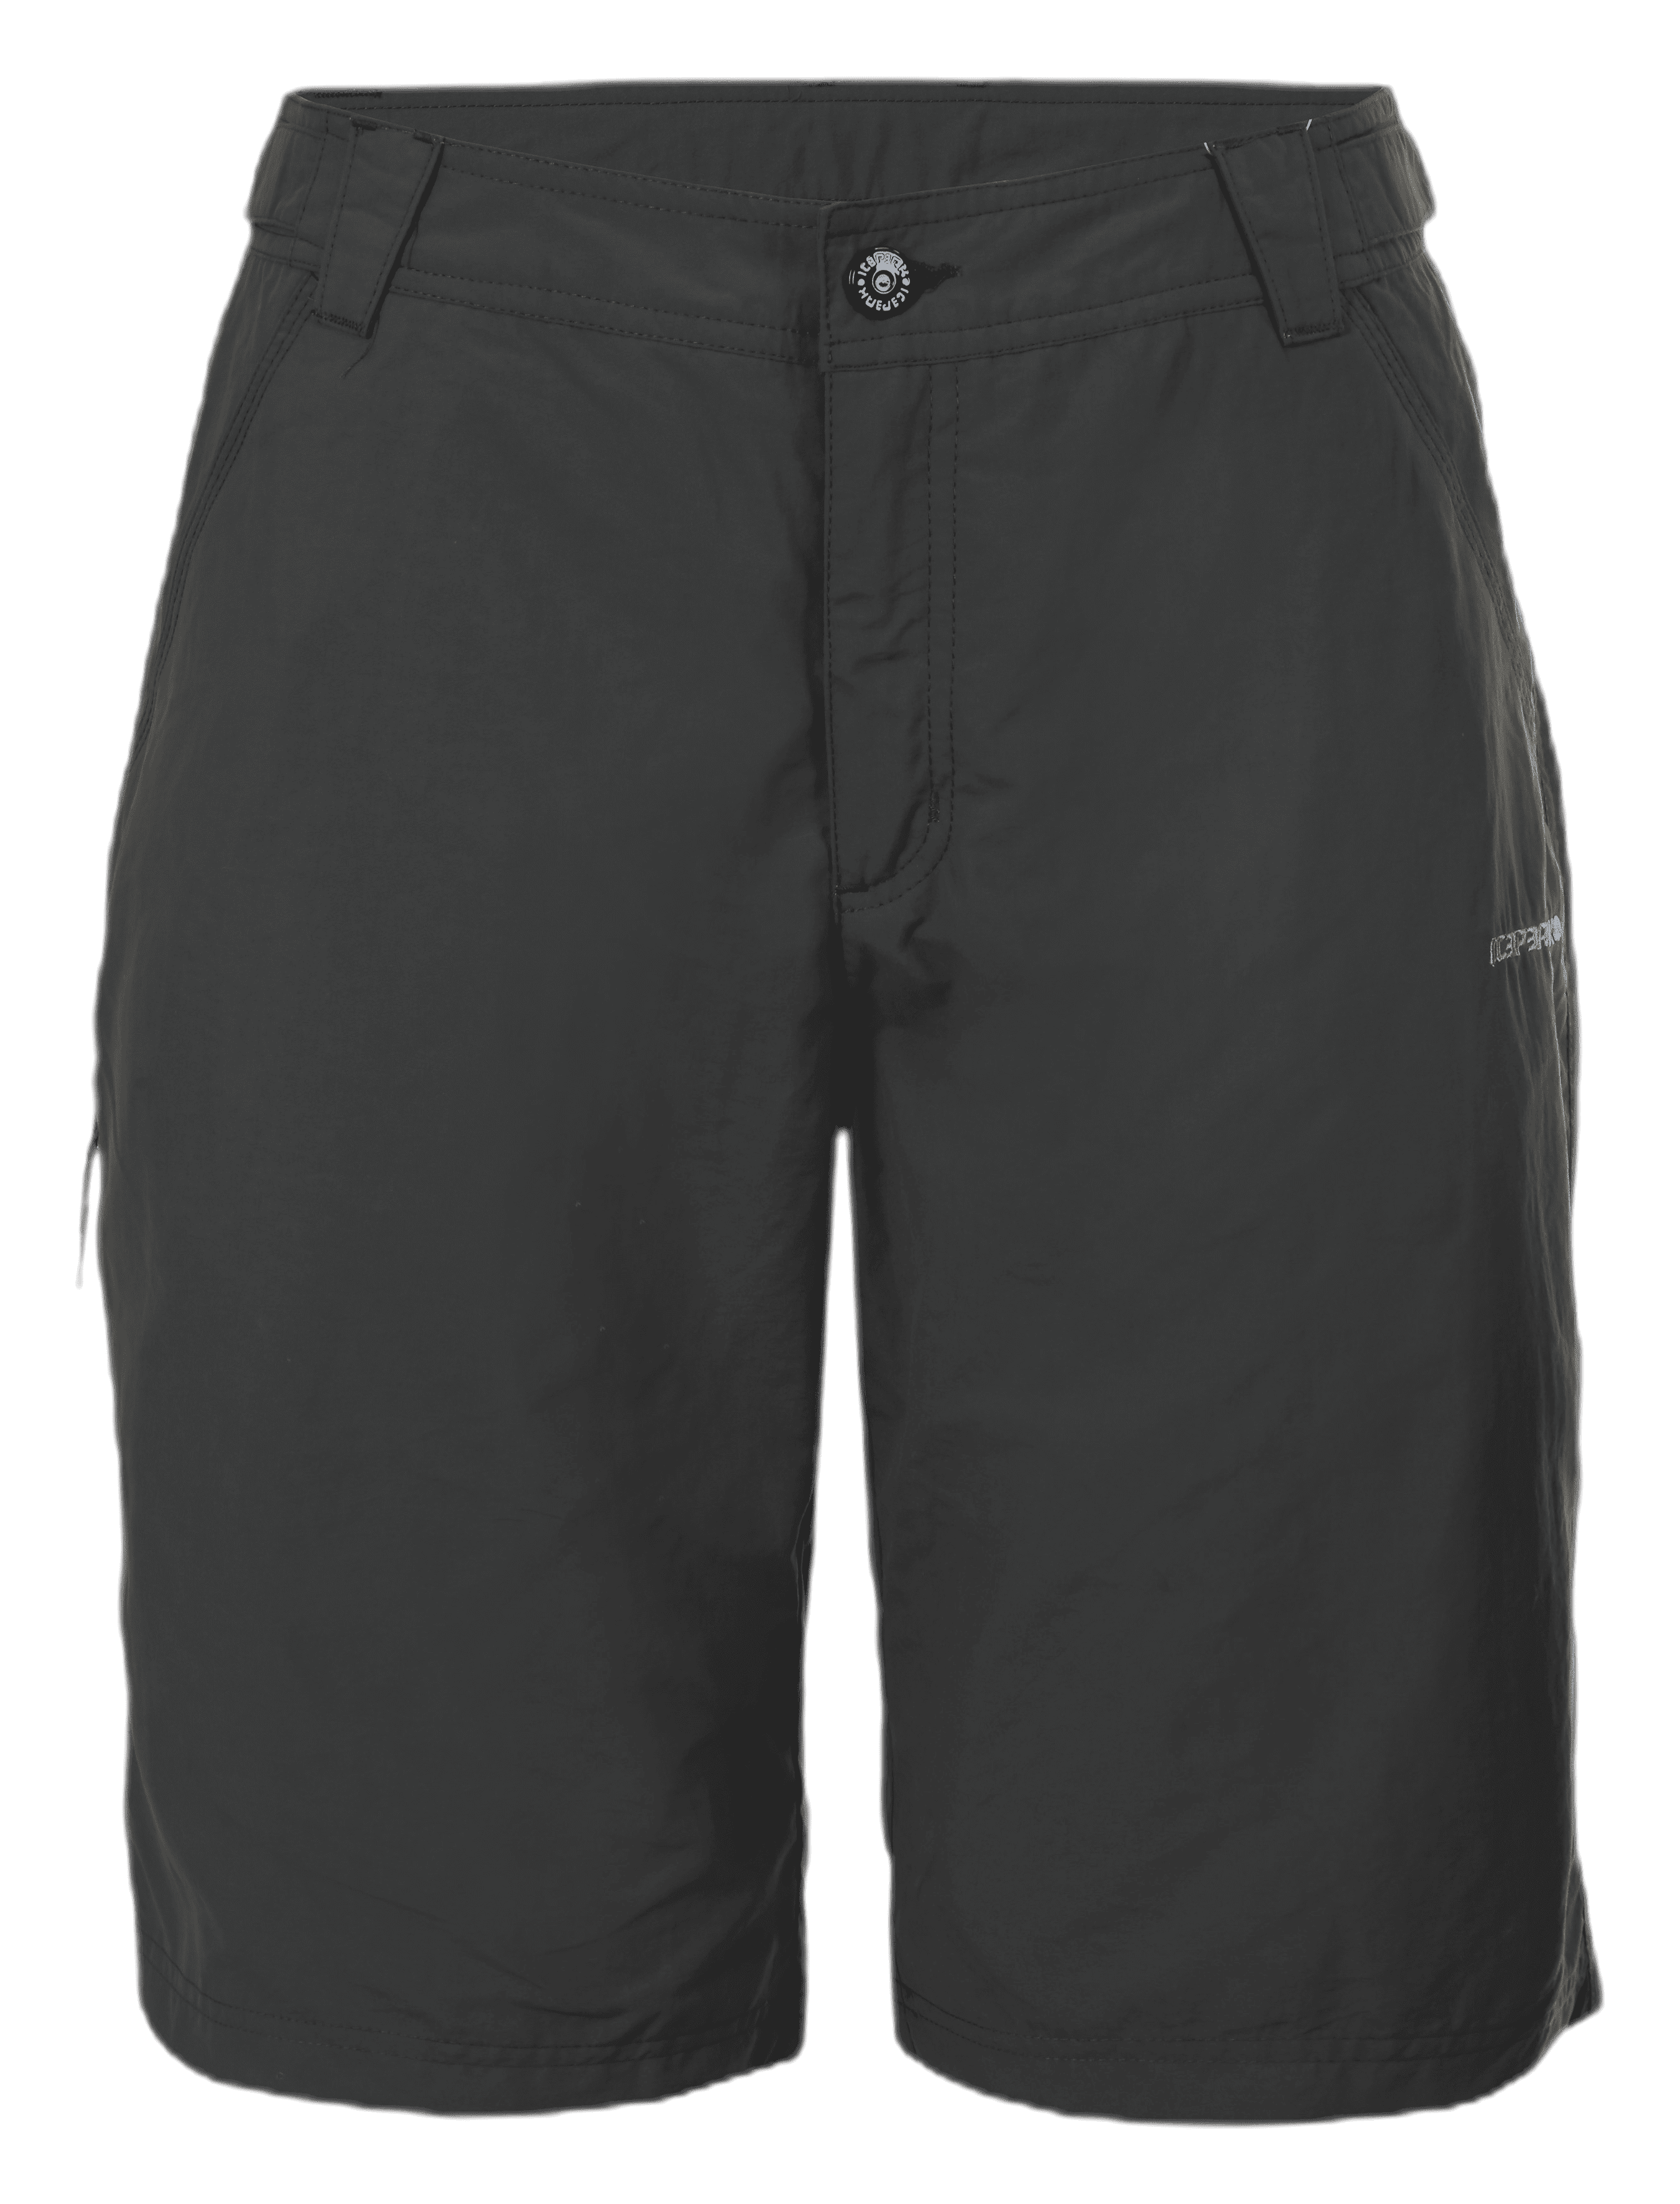 Shorts serafina